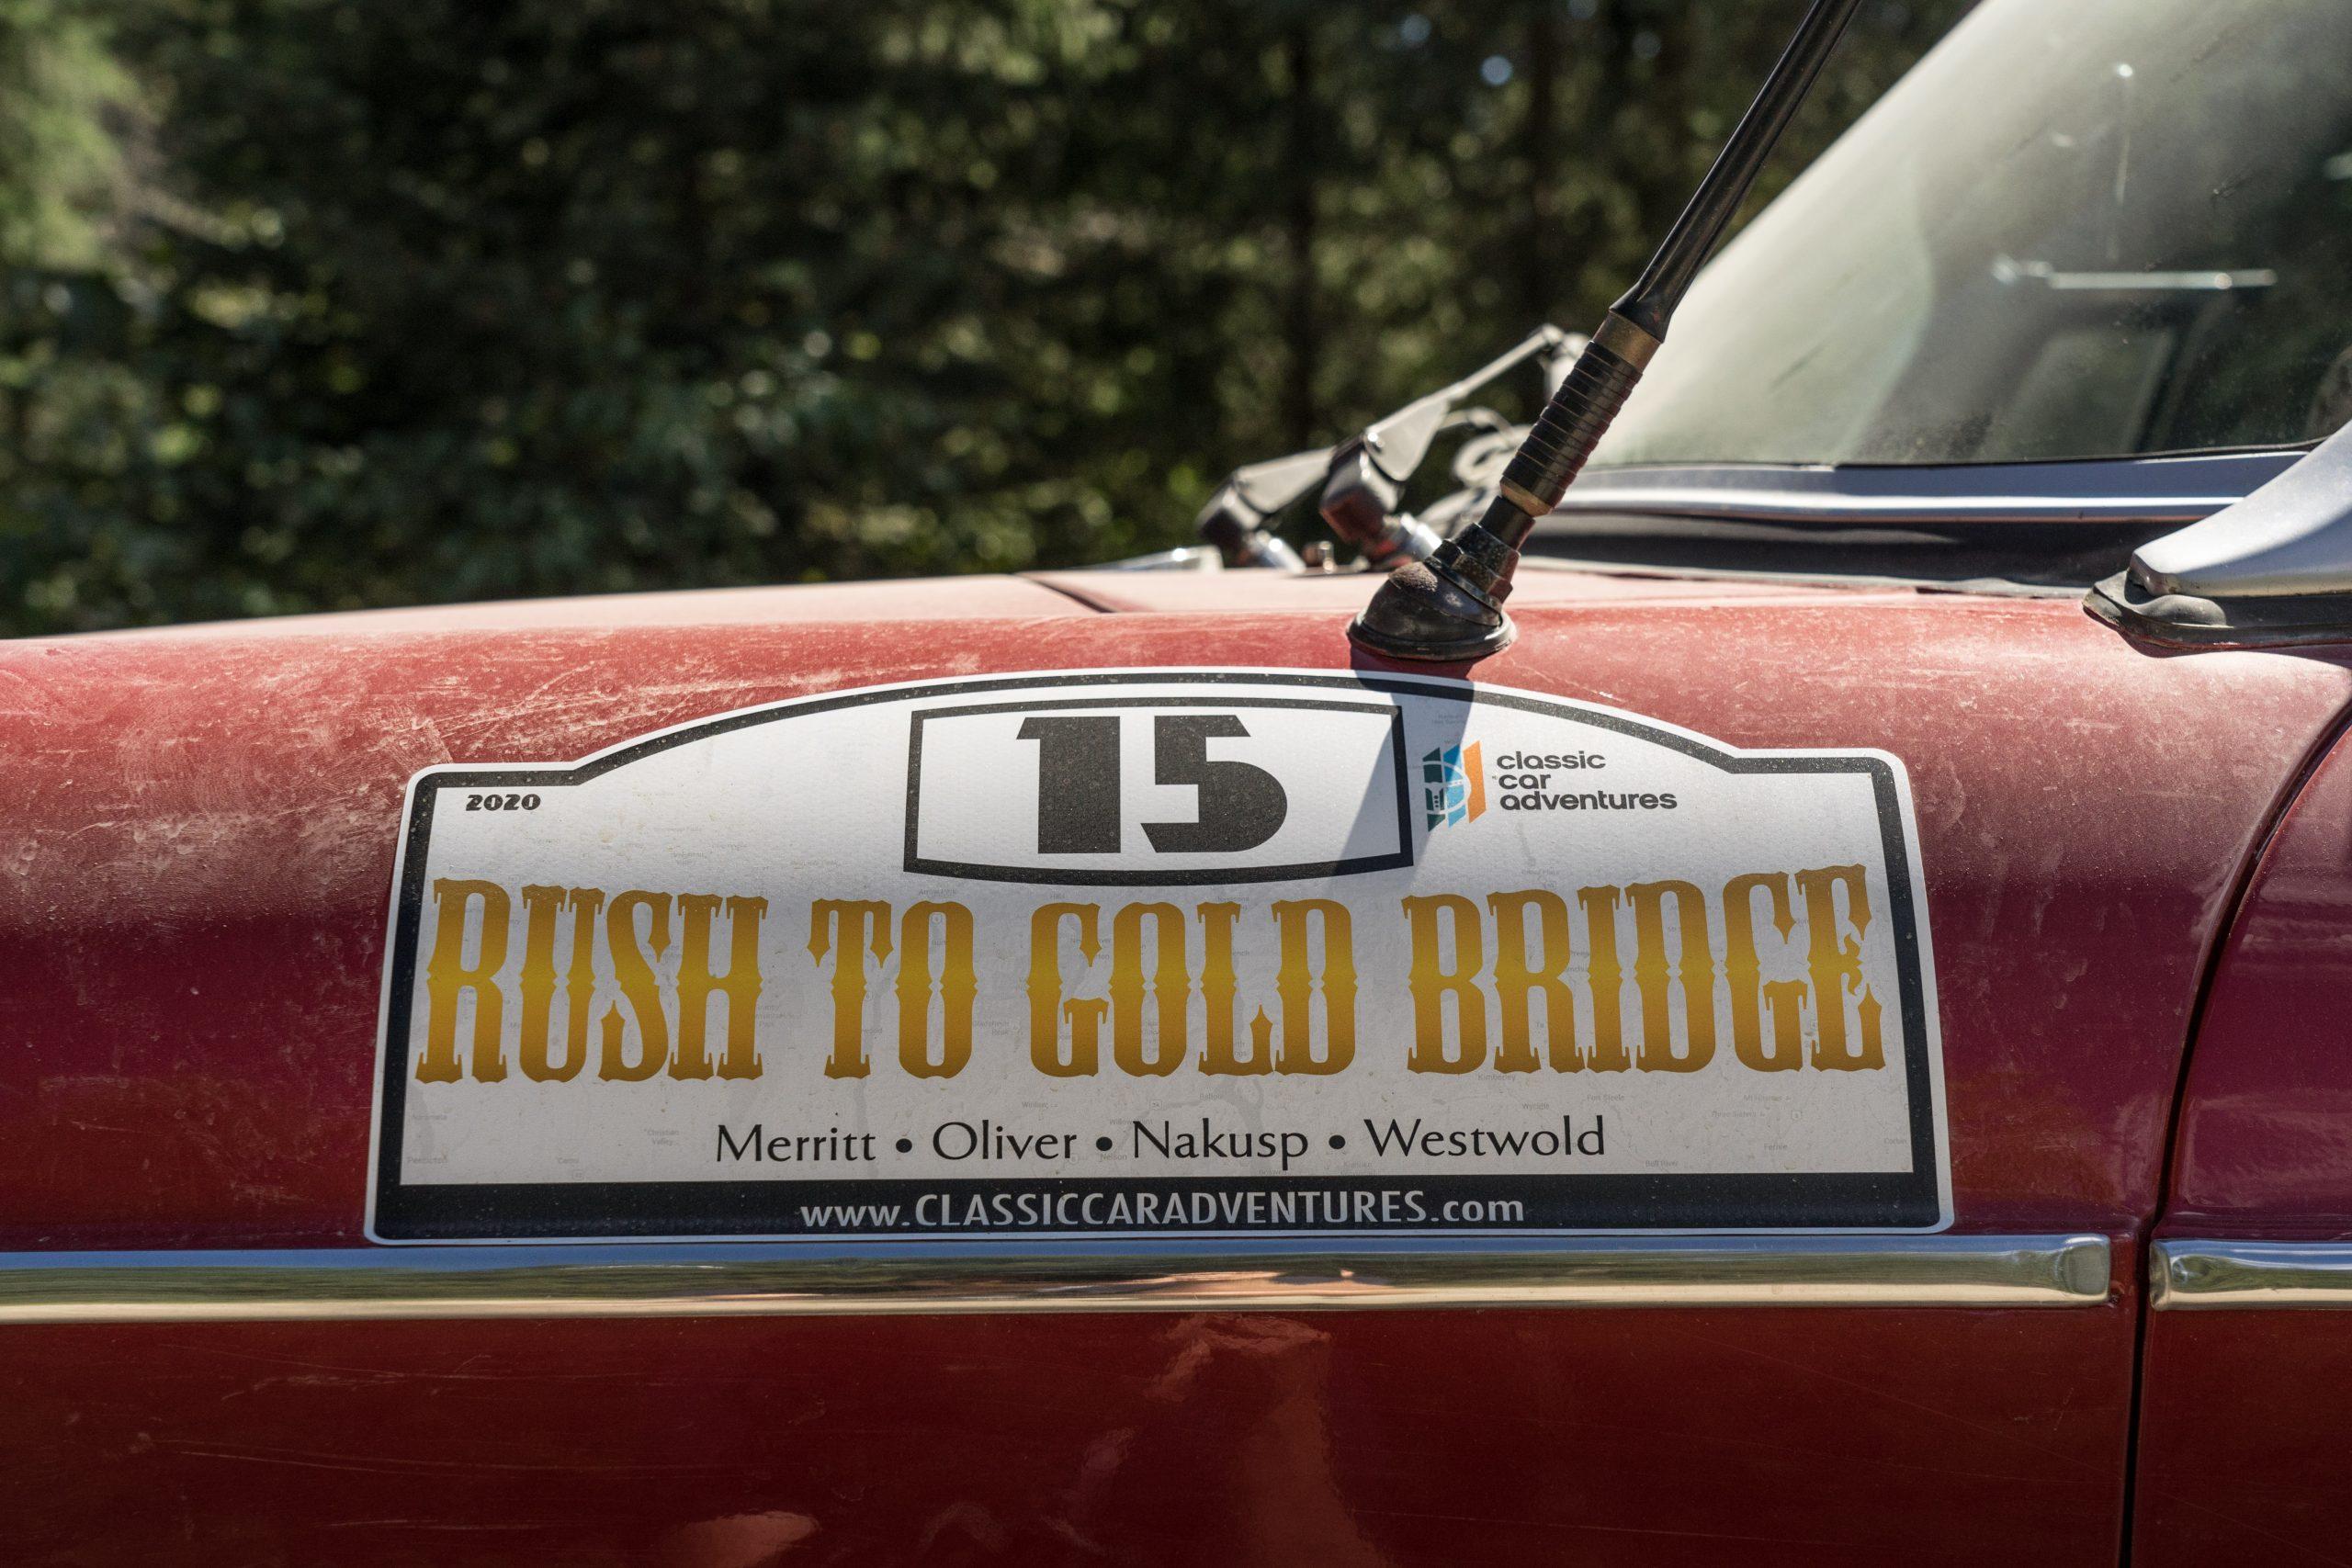 rush to gold bridge rally number